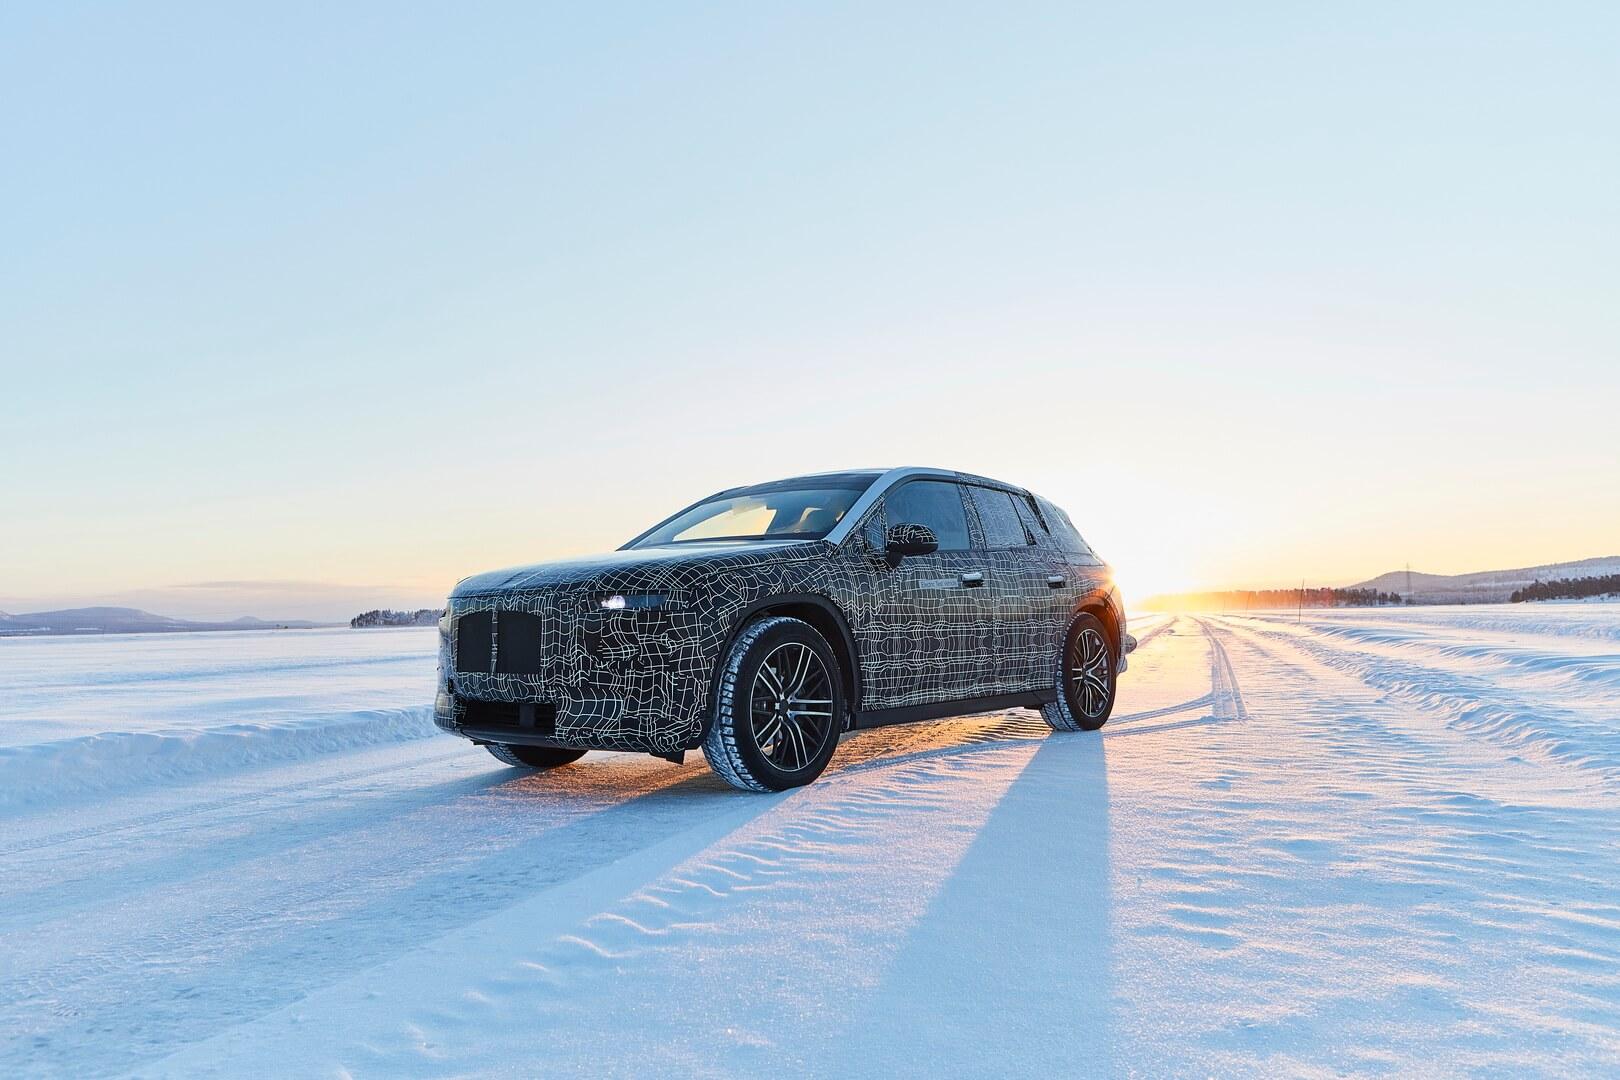 Тестовый прототип BMW iNEXT на зимних испытаниях